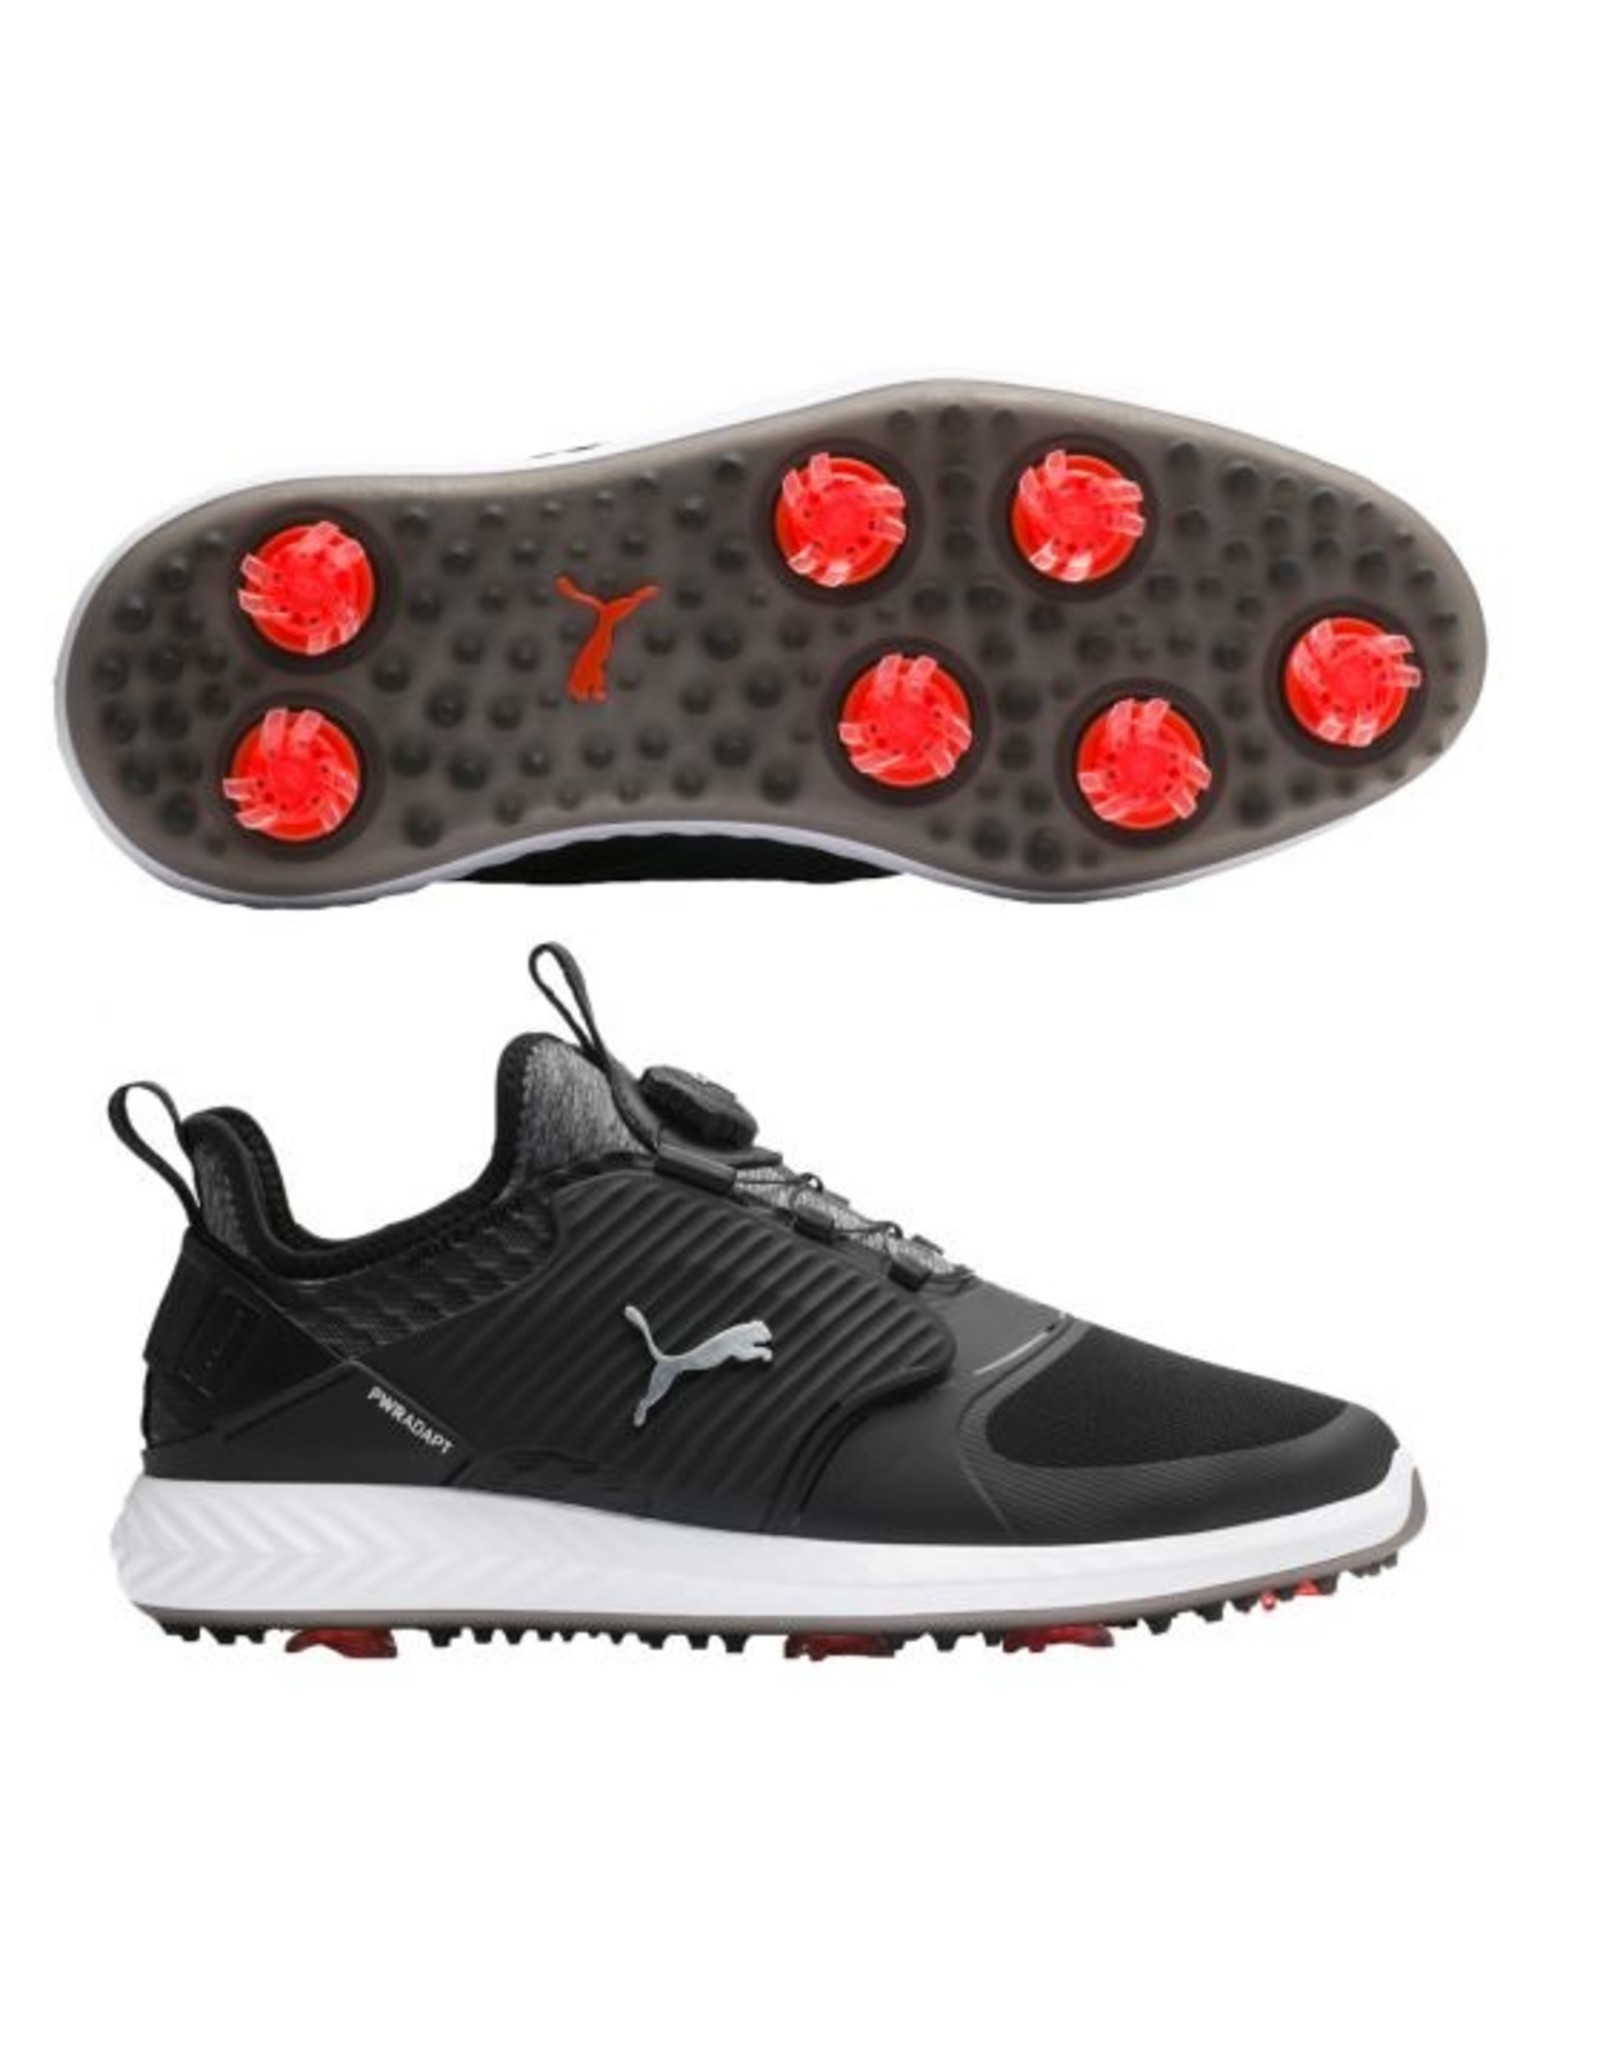 Puma Golf Puma Men's Ignite PWRADAPT Caged Disc Golf Shoes